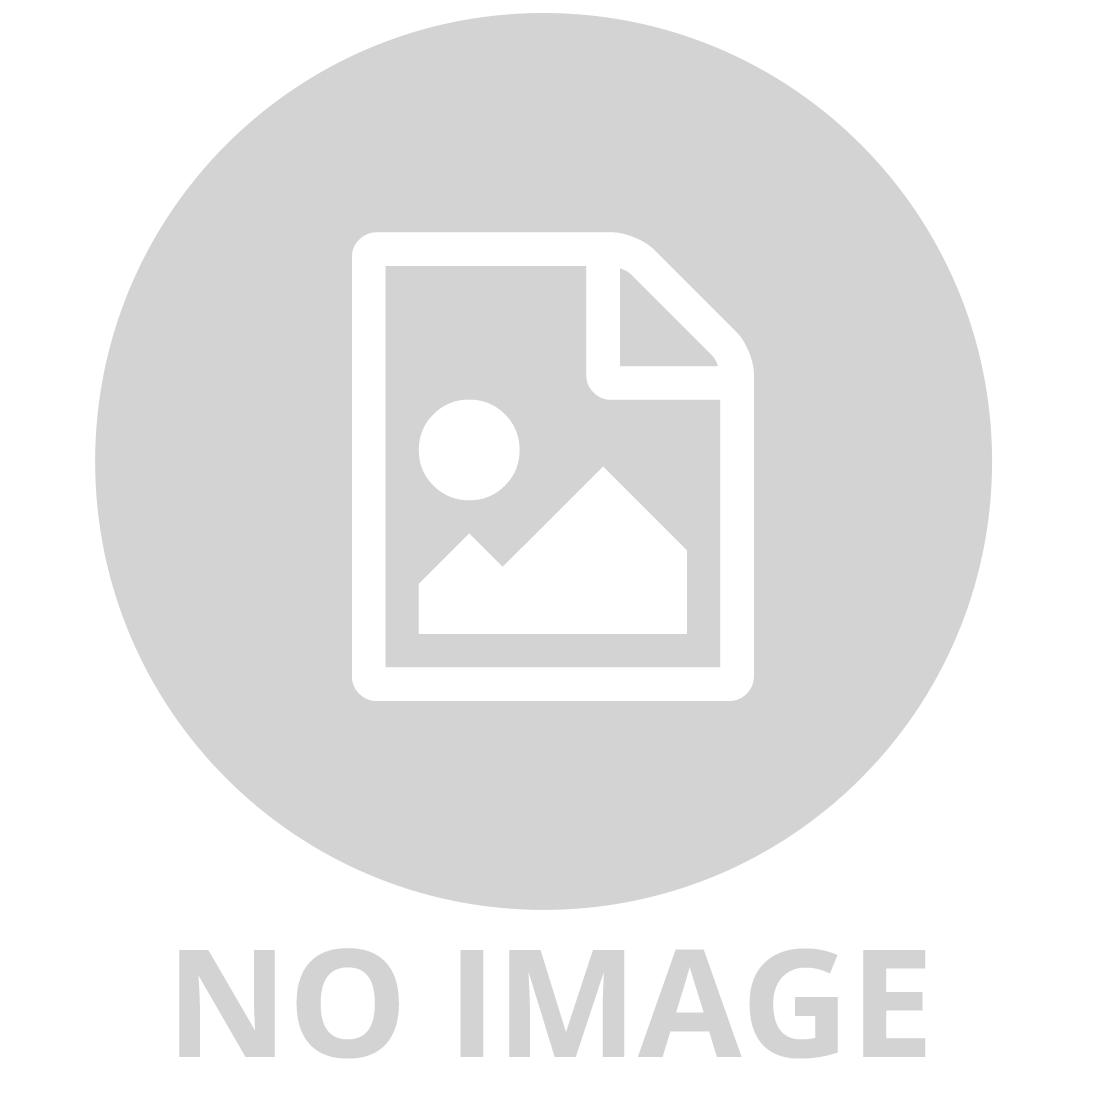 BRIO WORLD MINI STRAIGHT TRACK PACK